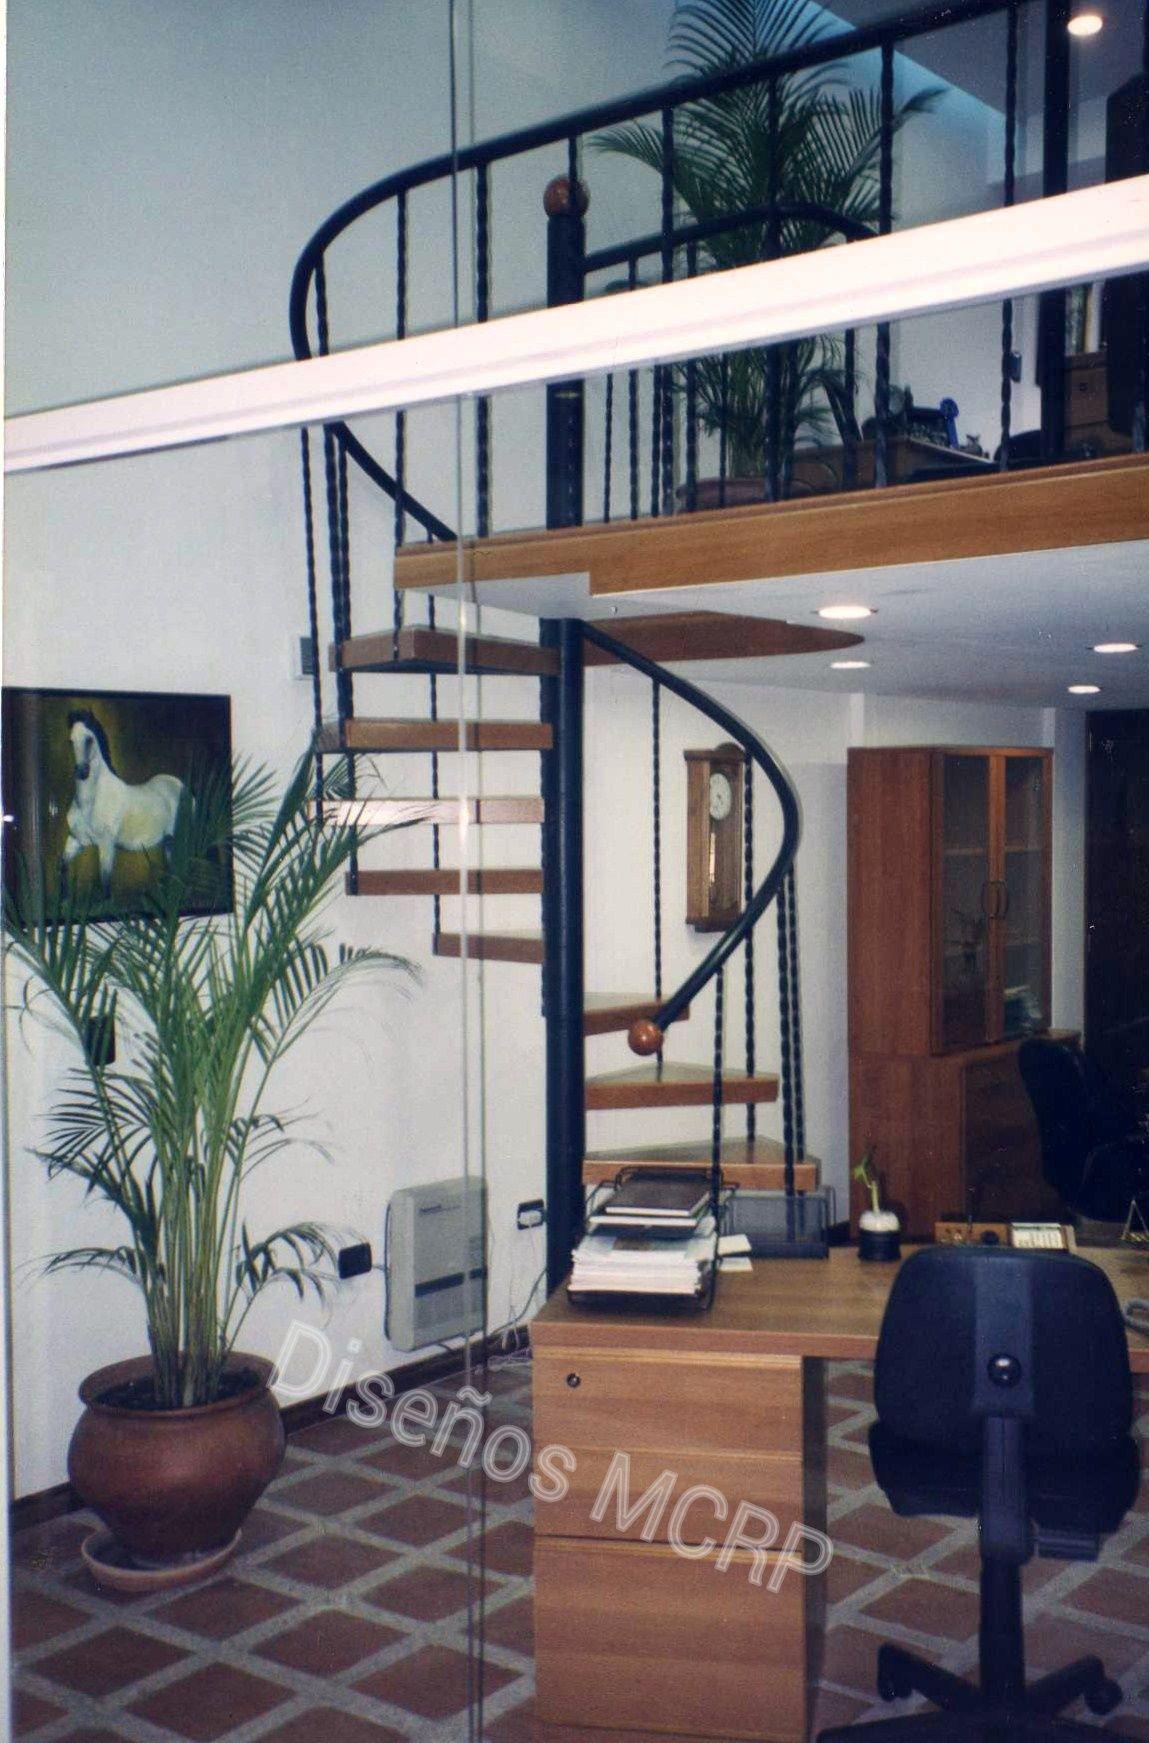 Escalera caracol de dise o baranda en hierro forjado for Escaleras hierro forjado